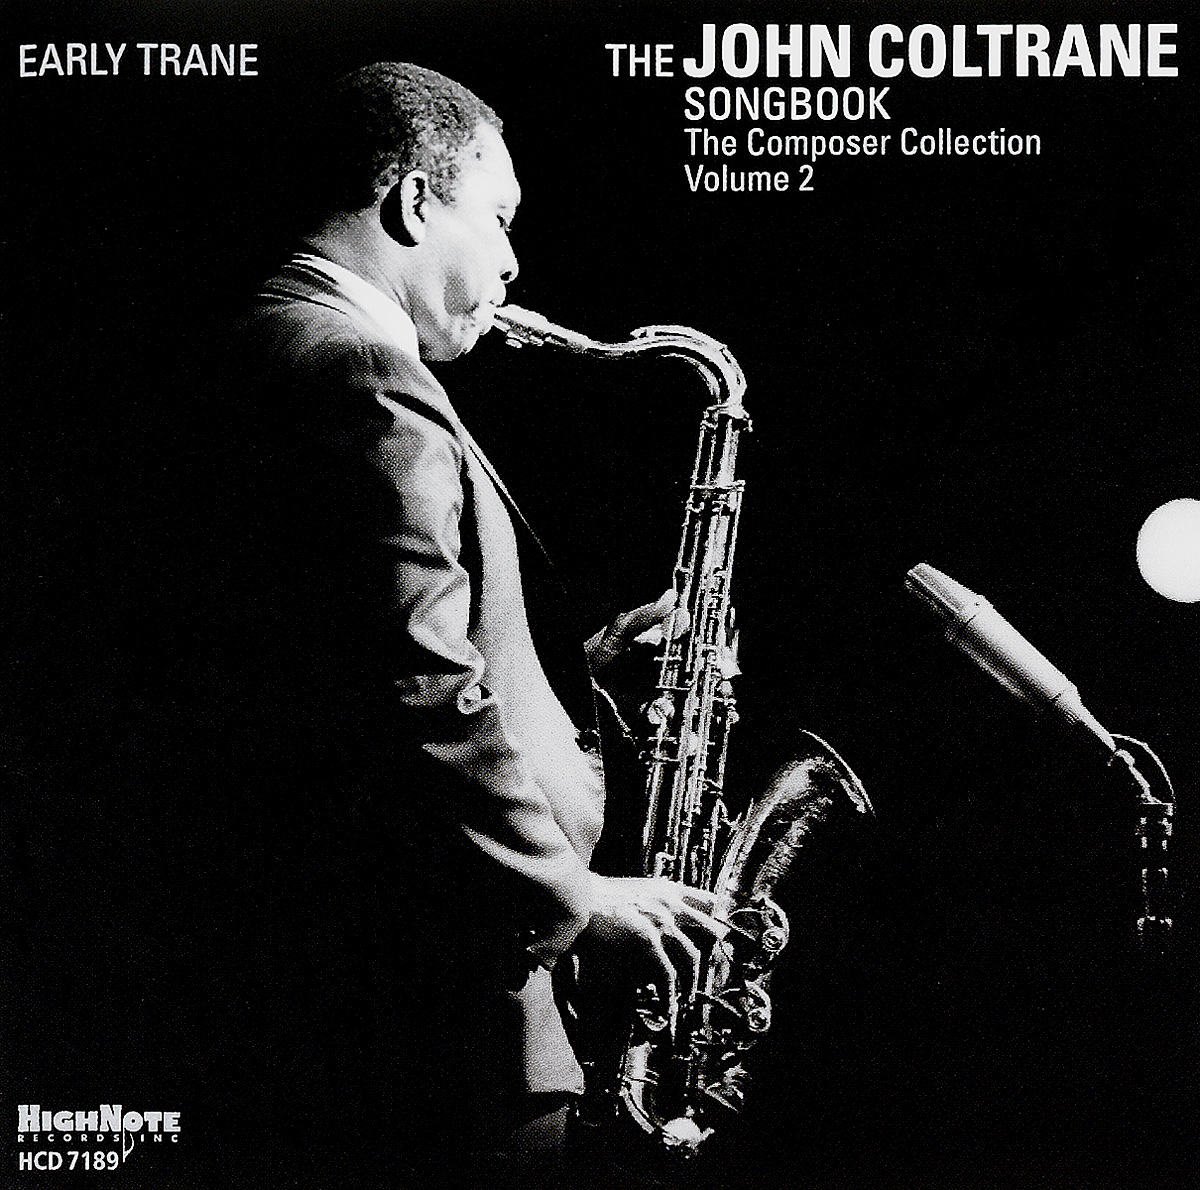 Джон Колтрейн The John Coltrane. Songbook Volume 2 джон колтрейн john coltrane giant steps the best of the early years 10 cd